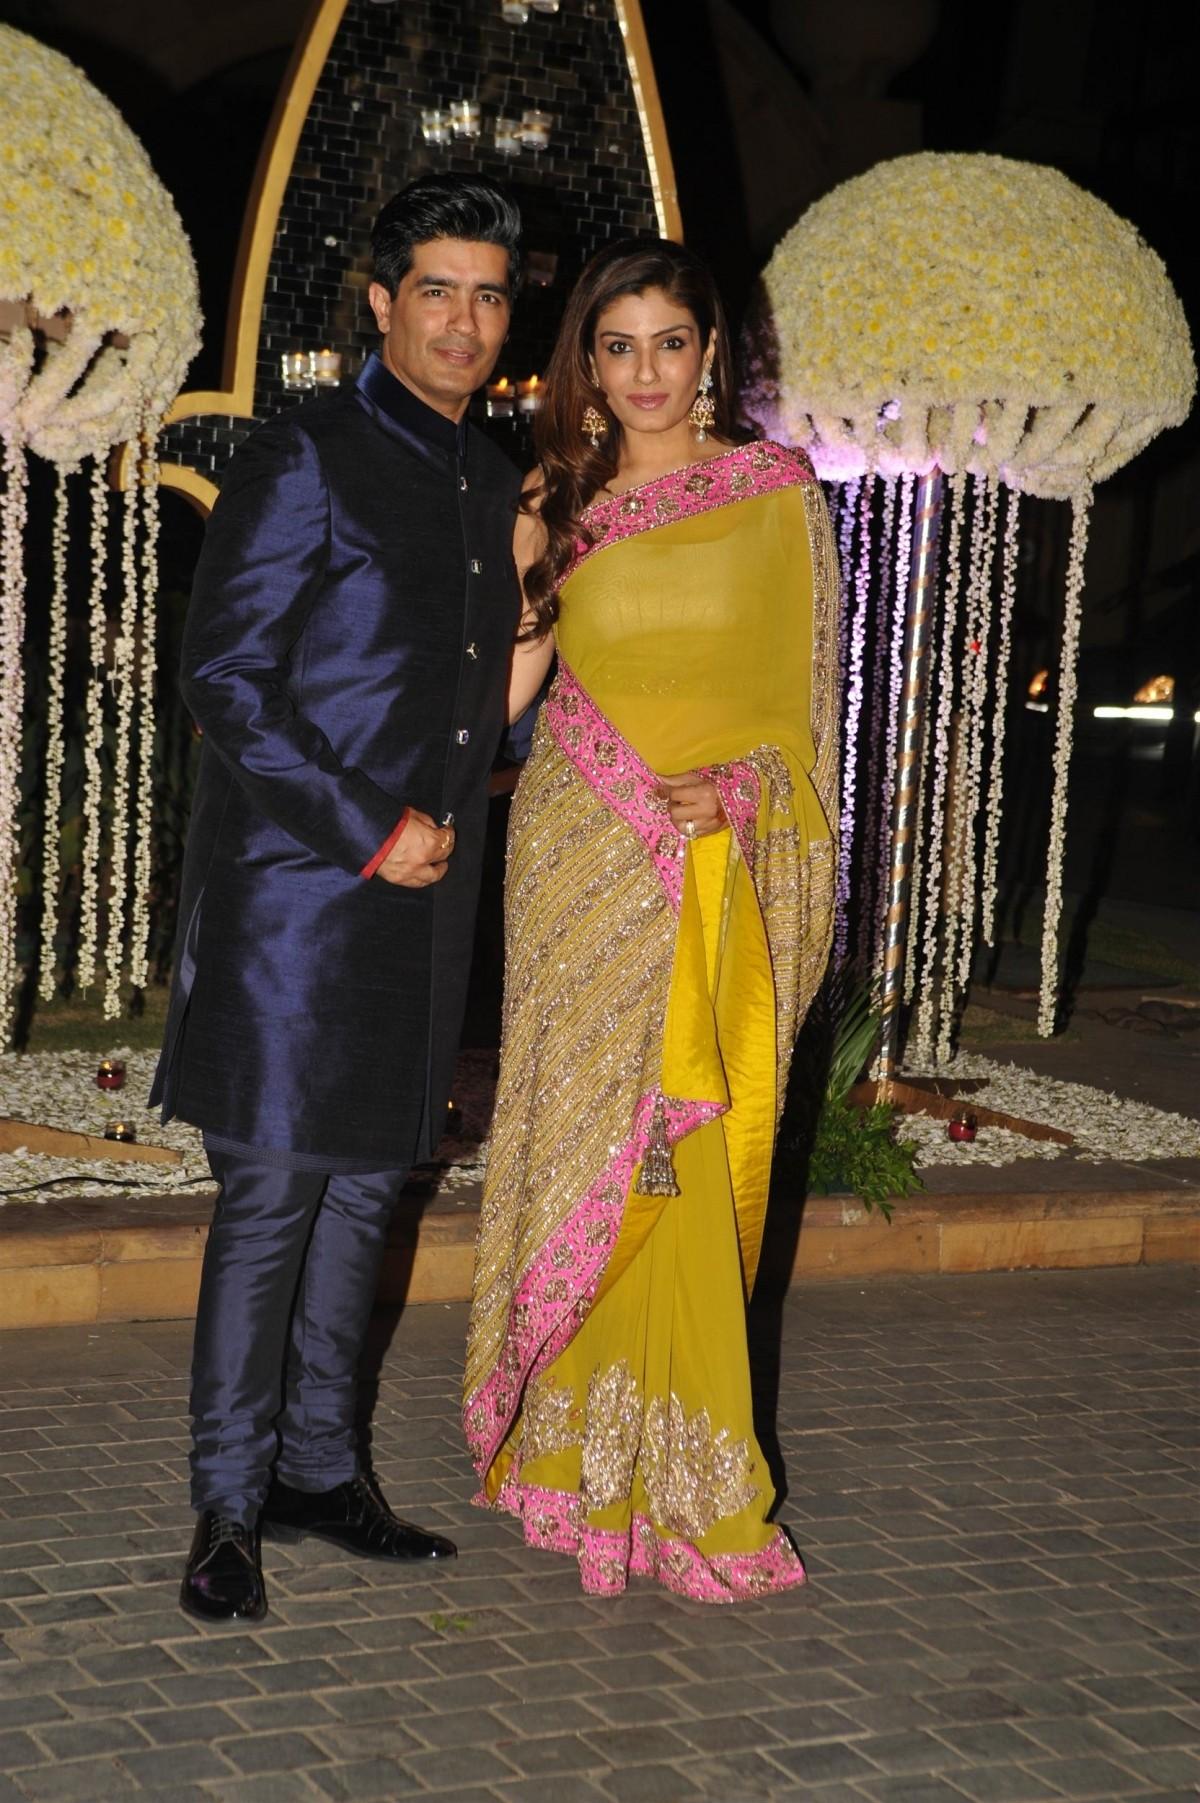 Manish Malhotra and Raveena Tandon